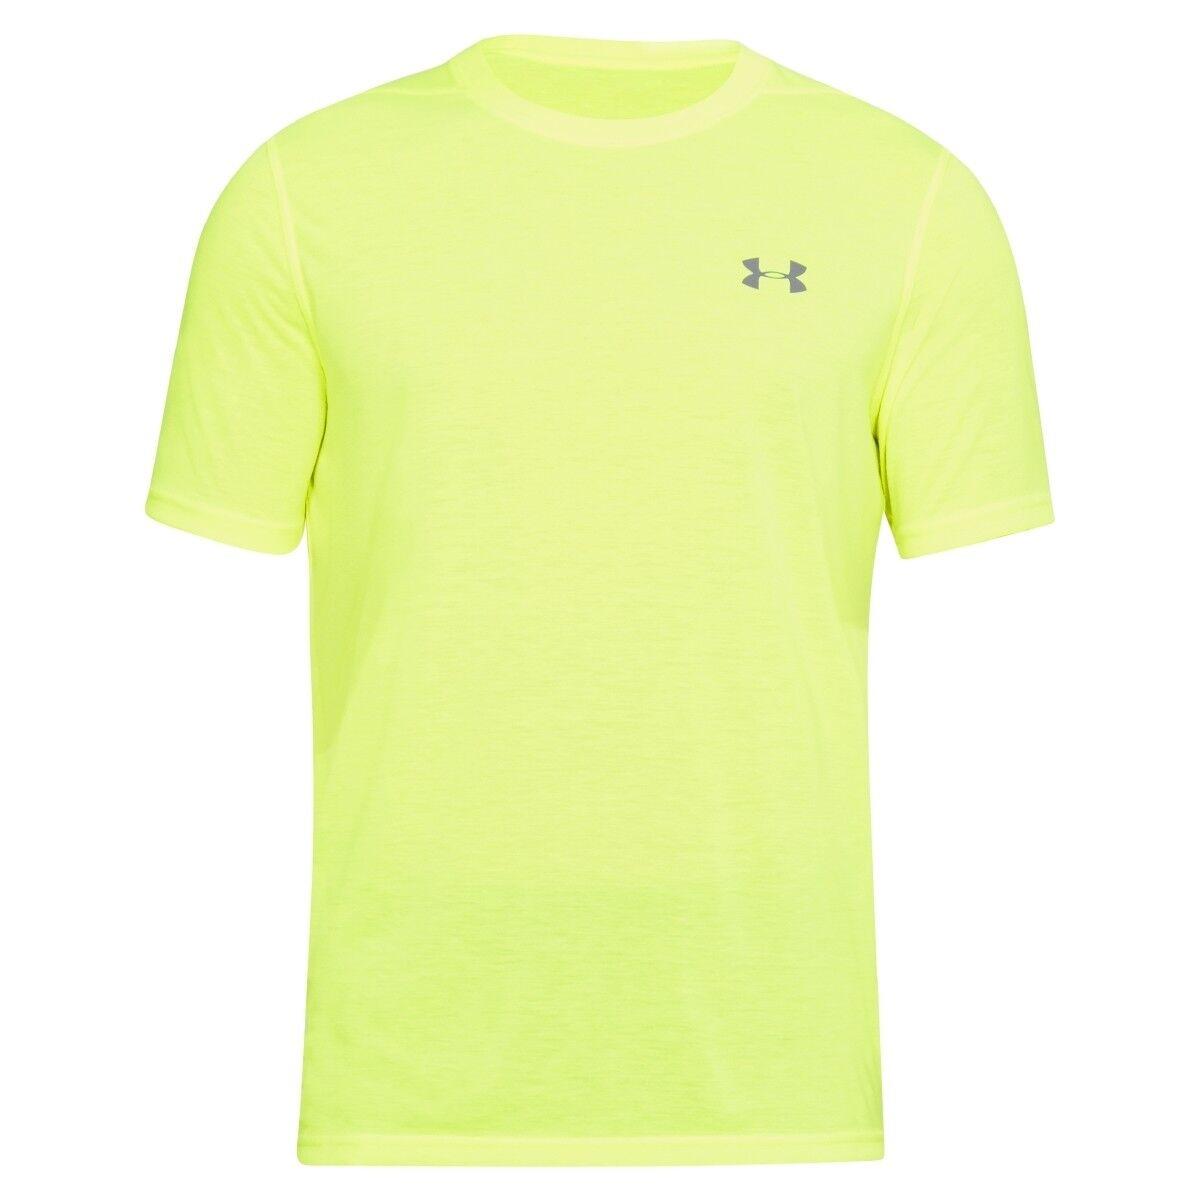 Under maglietta Armour threadborne SU MISURA maniche corte t-shirt maglietta Under GIALLO 649488